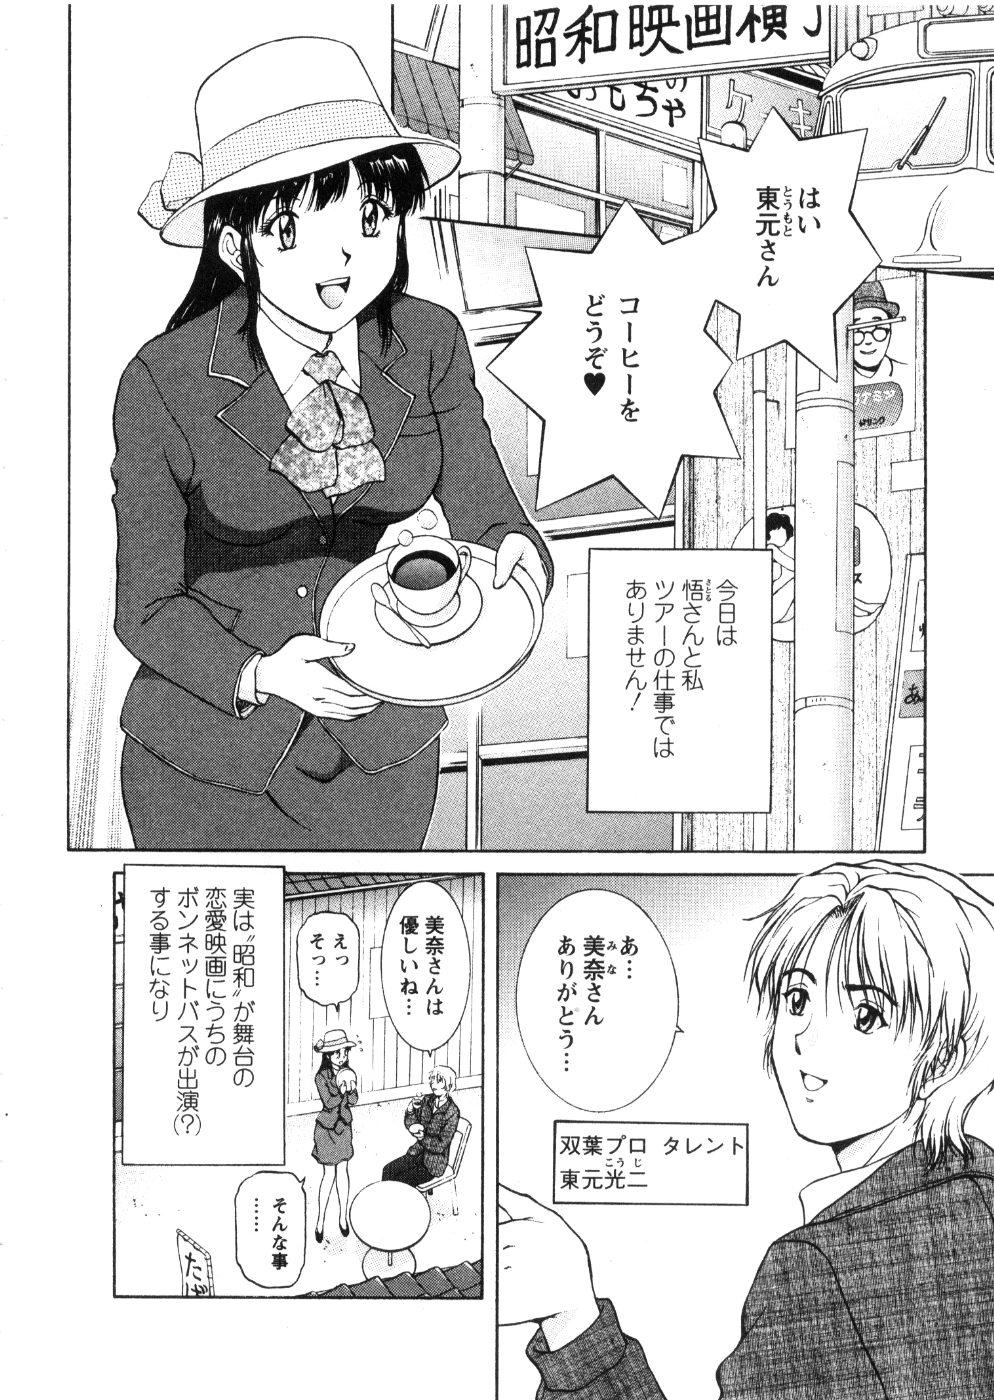 Oneechan-tachi ga Yatte Kuru 03 153